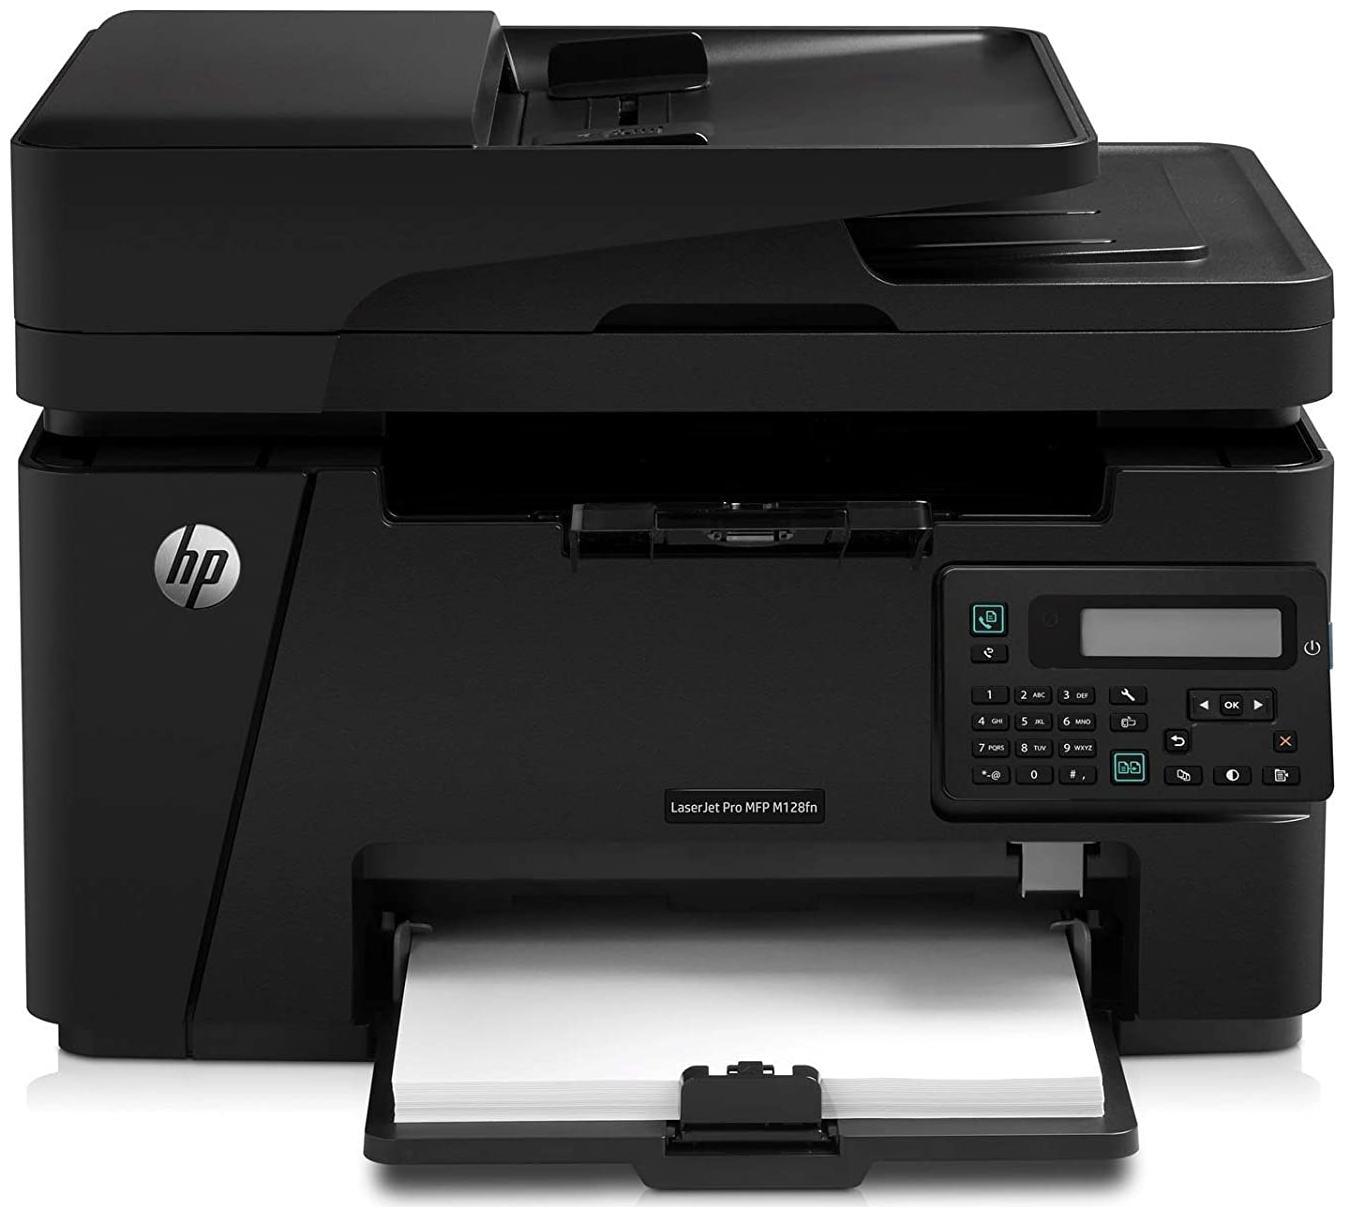 HP M128fn Multi Function Laser Printer by Priy Corporation